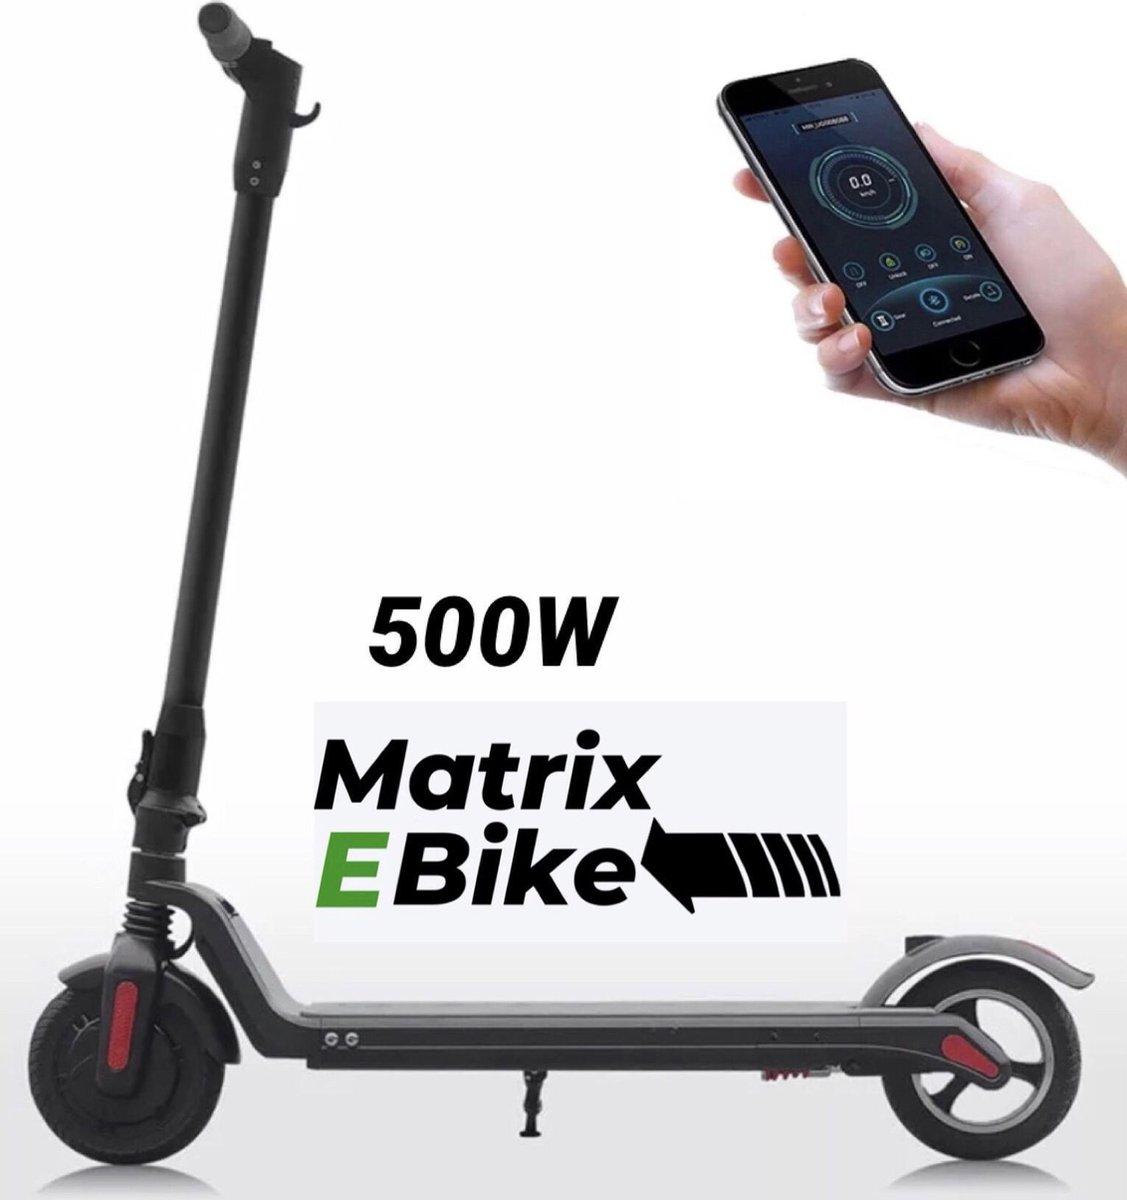 Matrix E Bike Pro FX8 - Maximale Snelheid 30km/h - 500 Watt Motor - Elektrische step - Zwart - IOS -